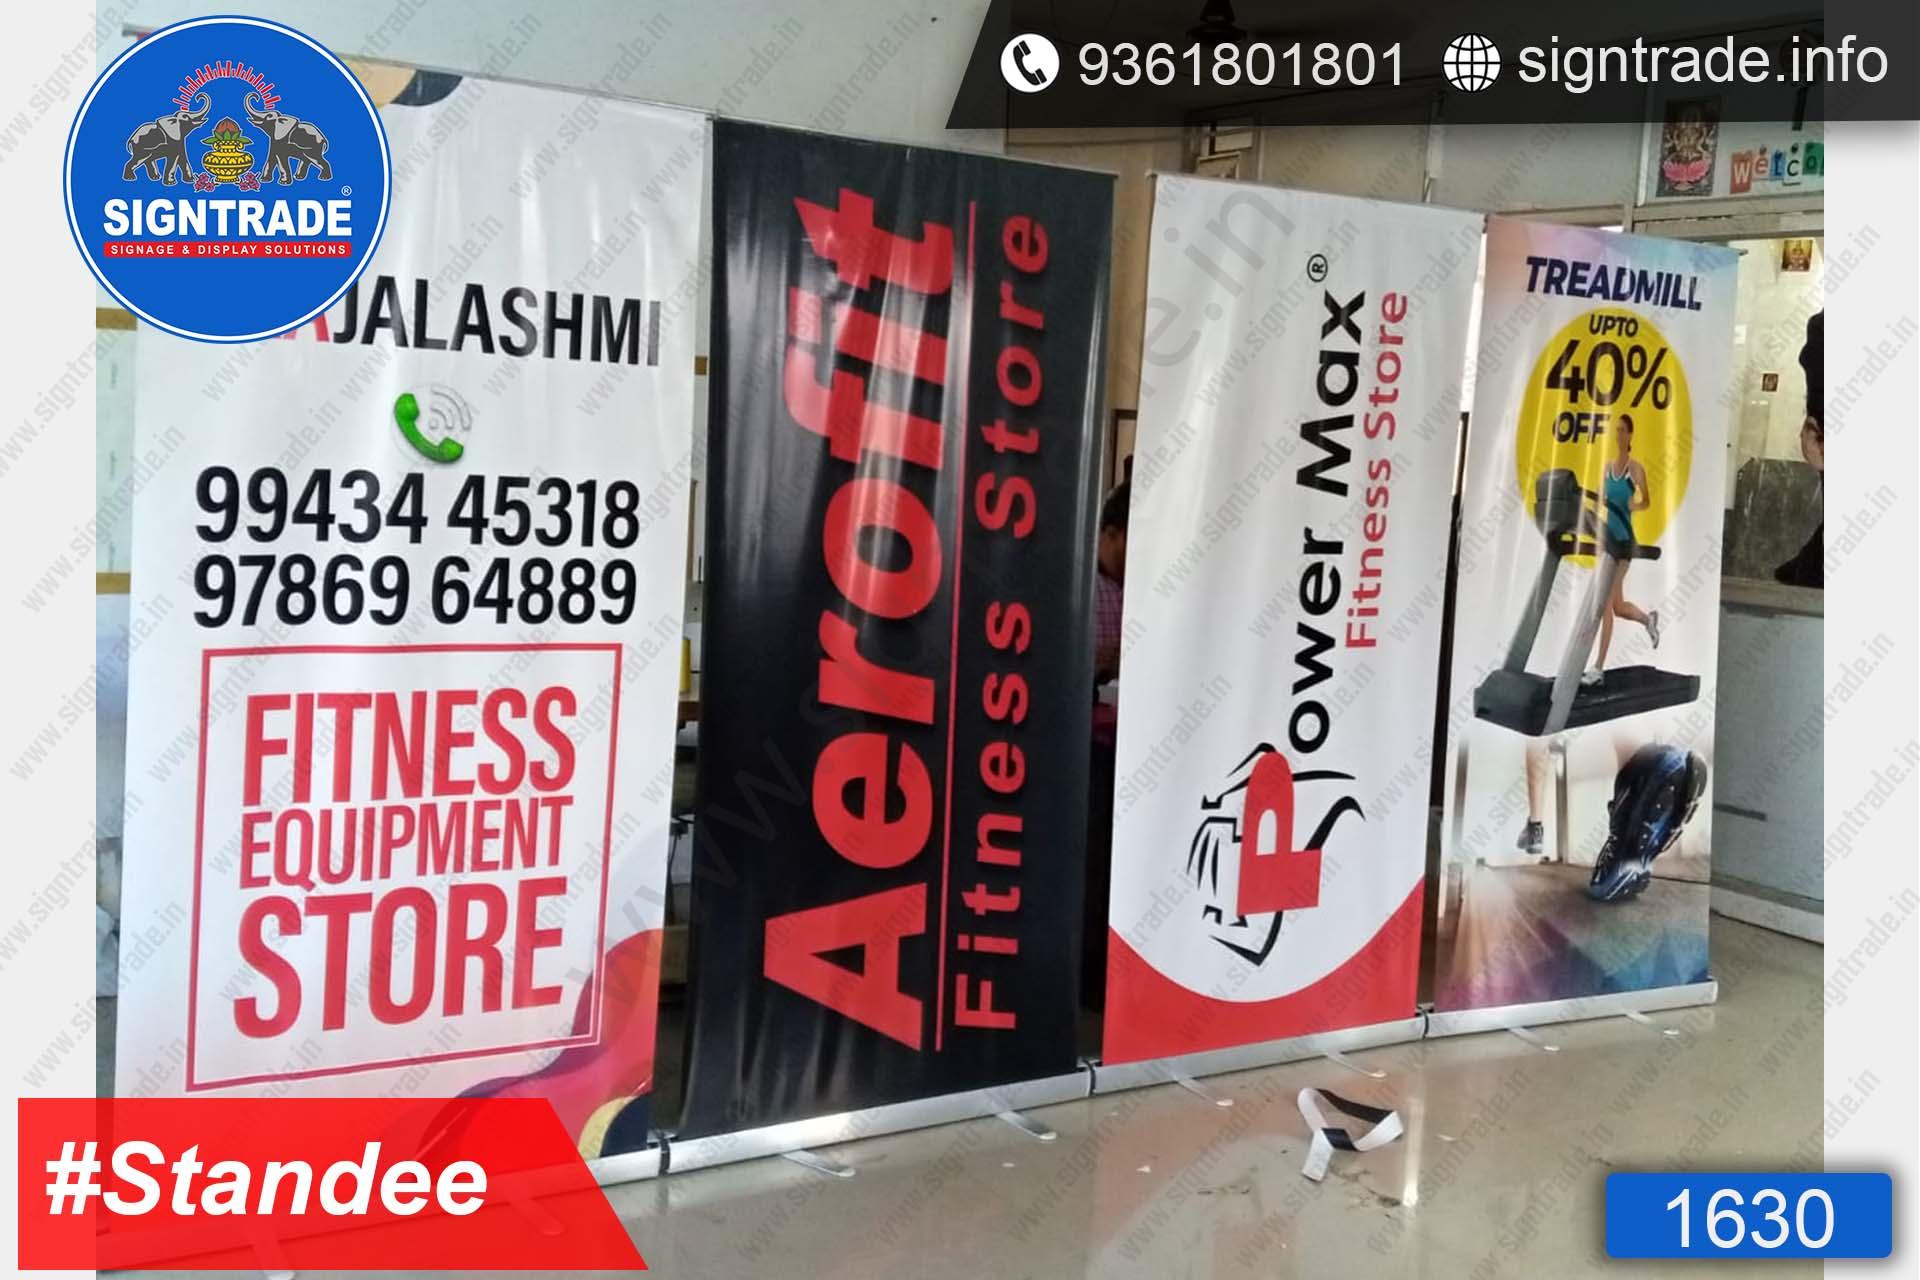 Aerofit Fitness Store, Chennai - Rollup Banner Stand - SIGNTRADE - Rollup Banner Stand Manufactures in Chennai